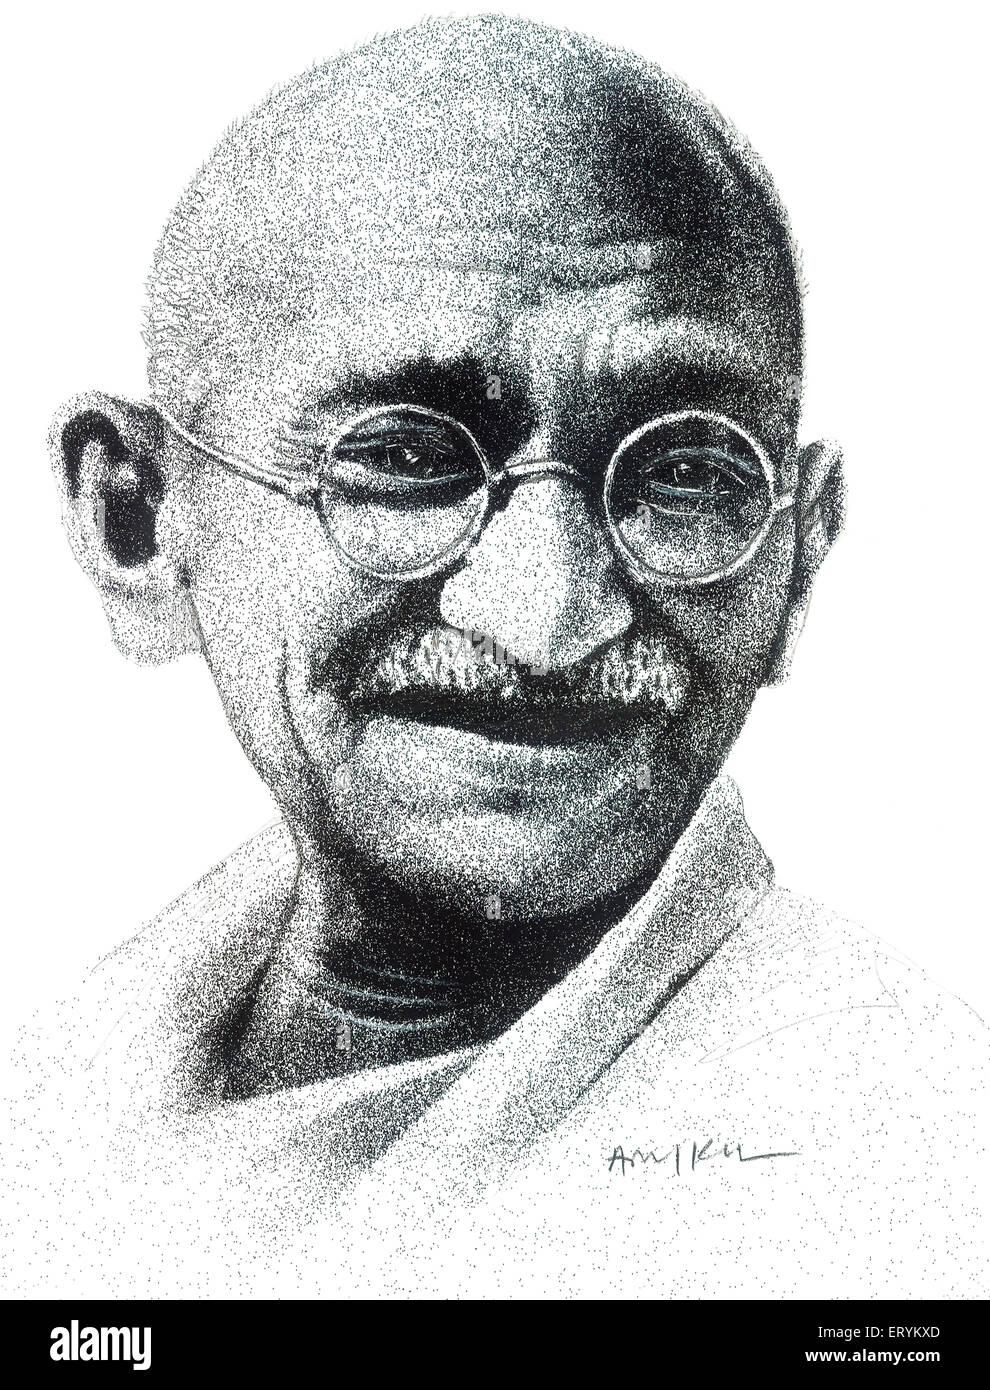 Drawing of mohandas karamchand gandhi stock photo 83586901